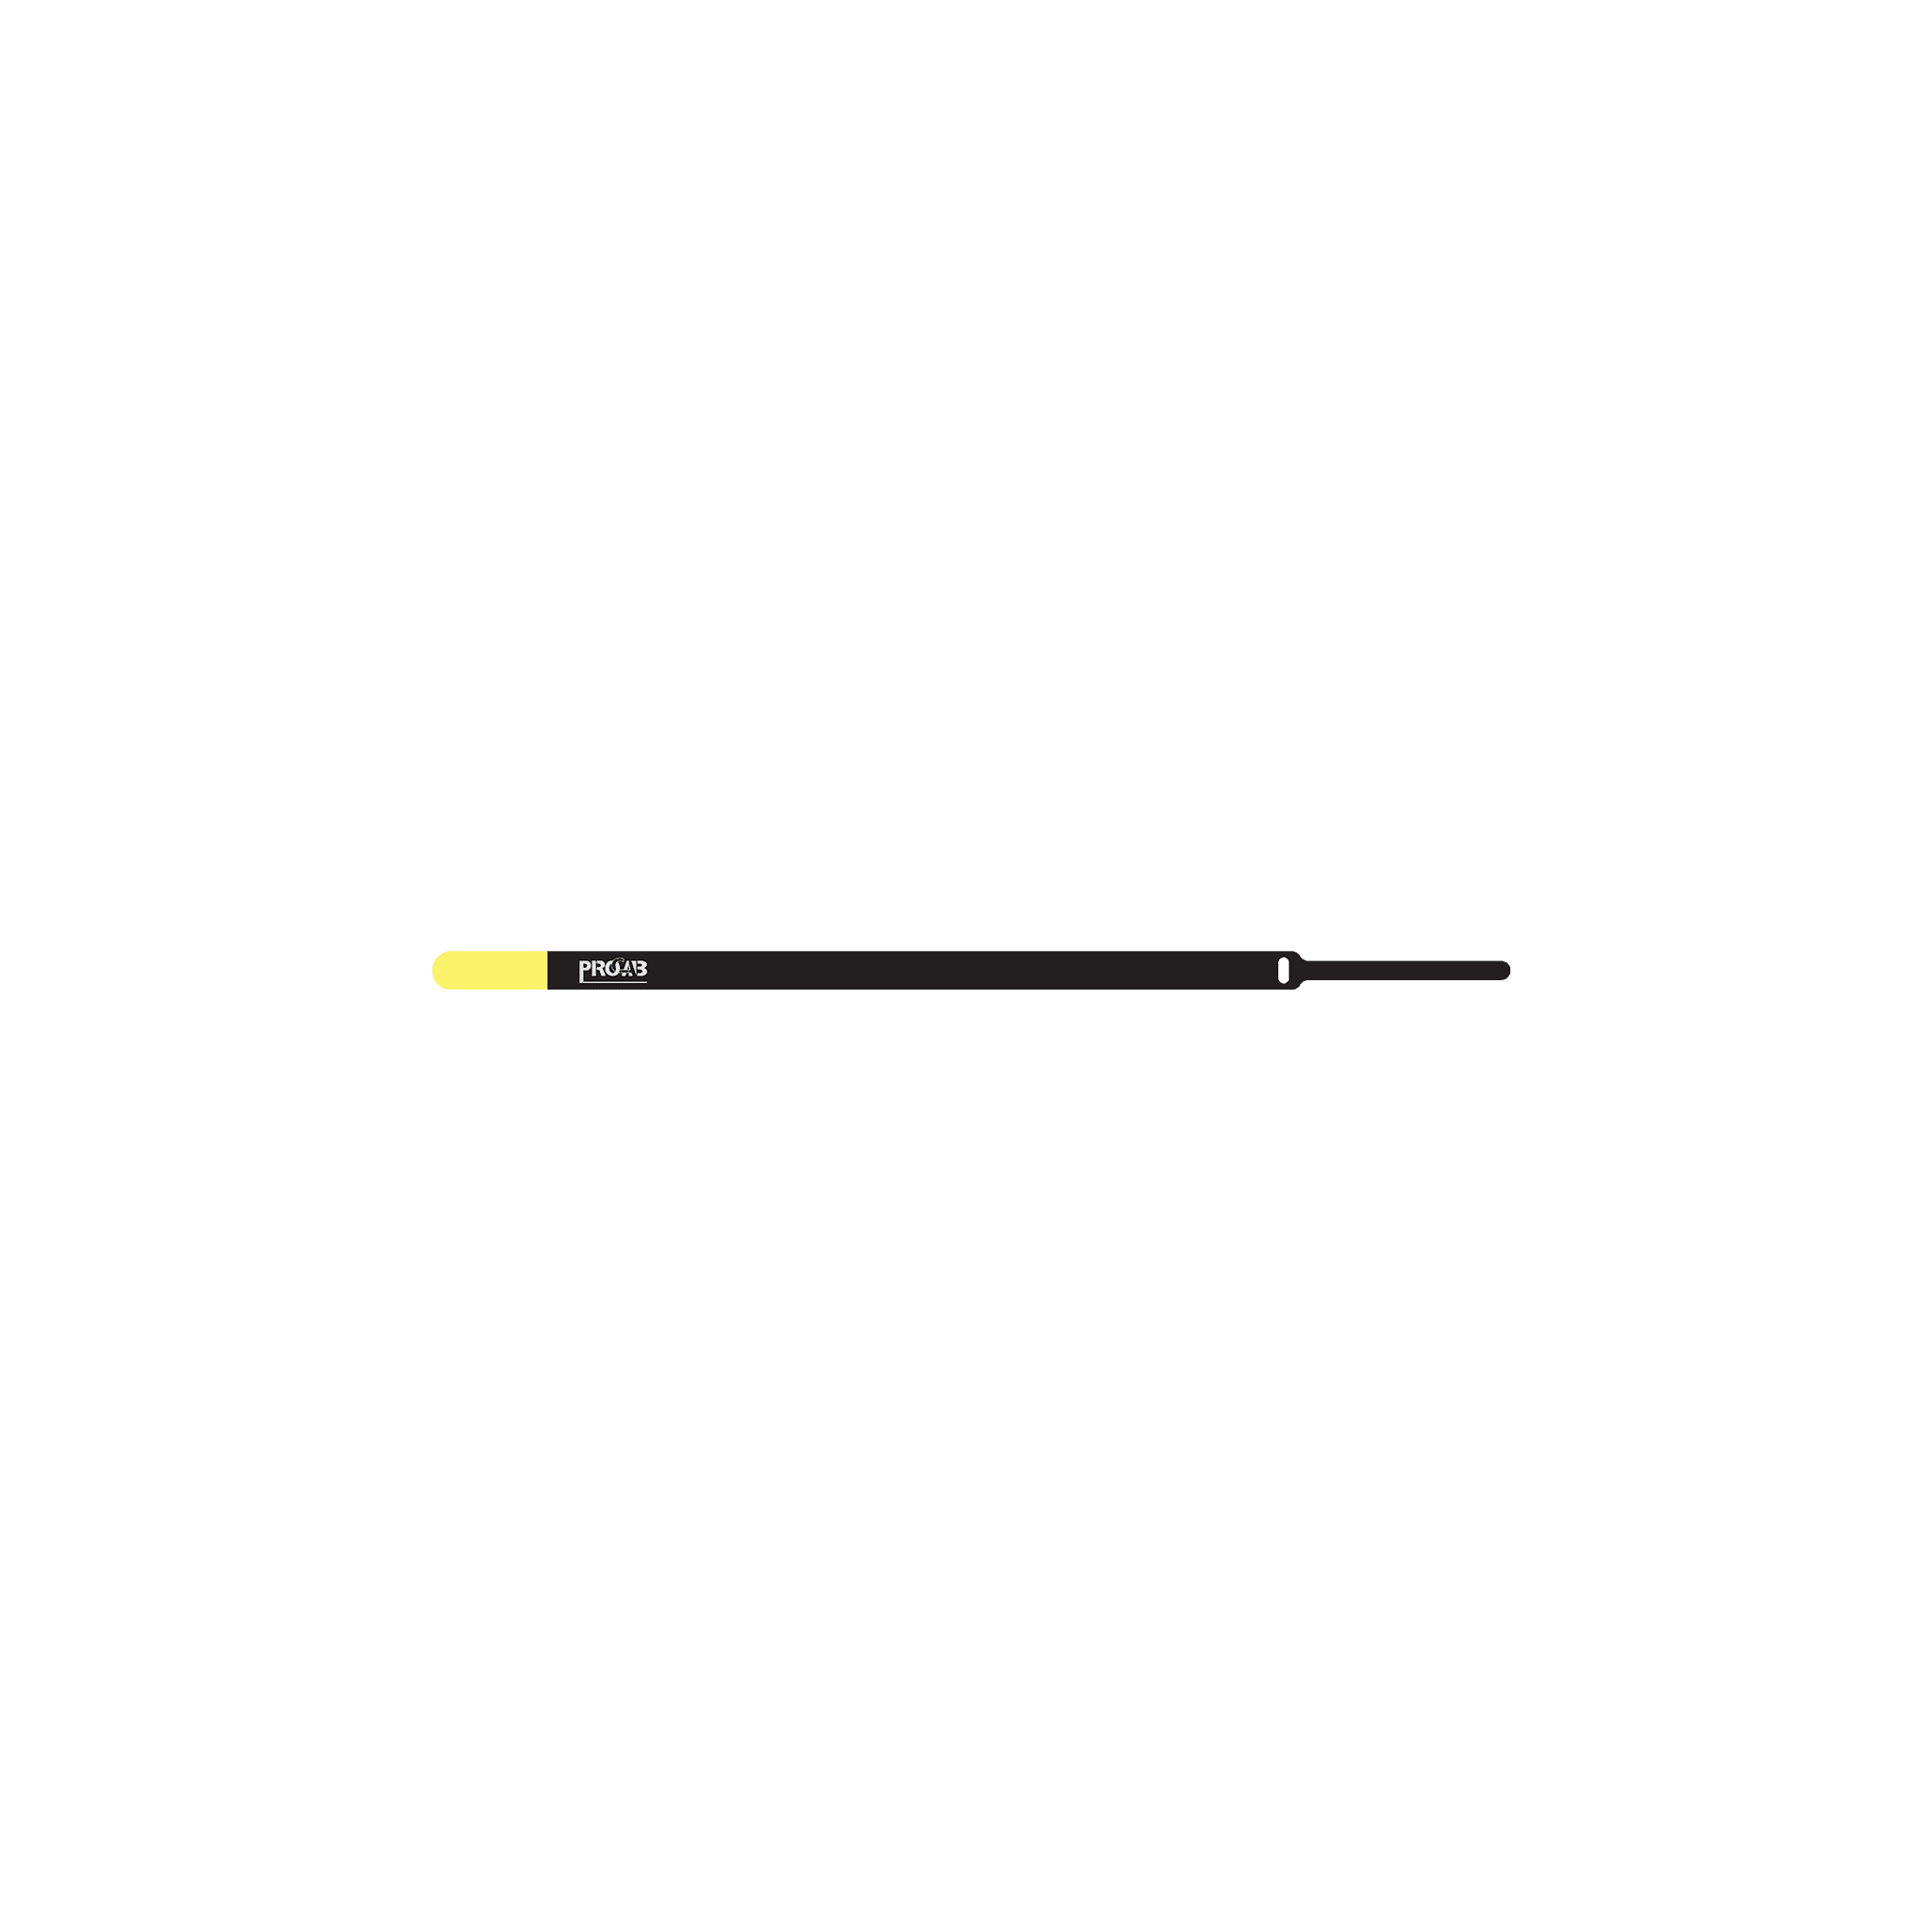 CLT450 - Premium hook & loop cable tie pack 15 x 450 mm - 10 pieces